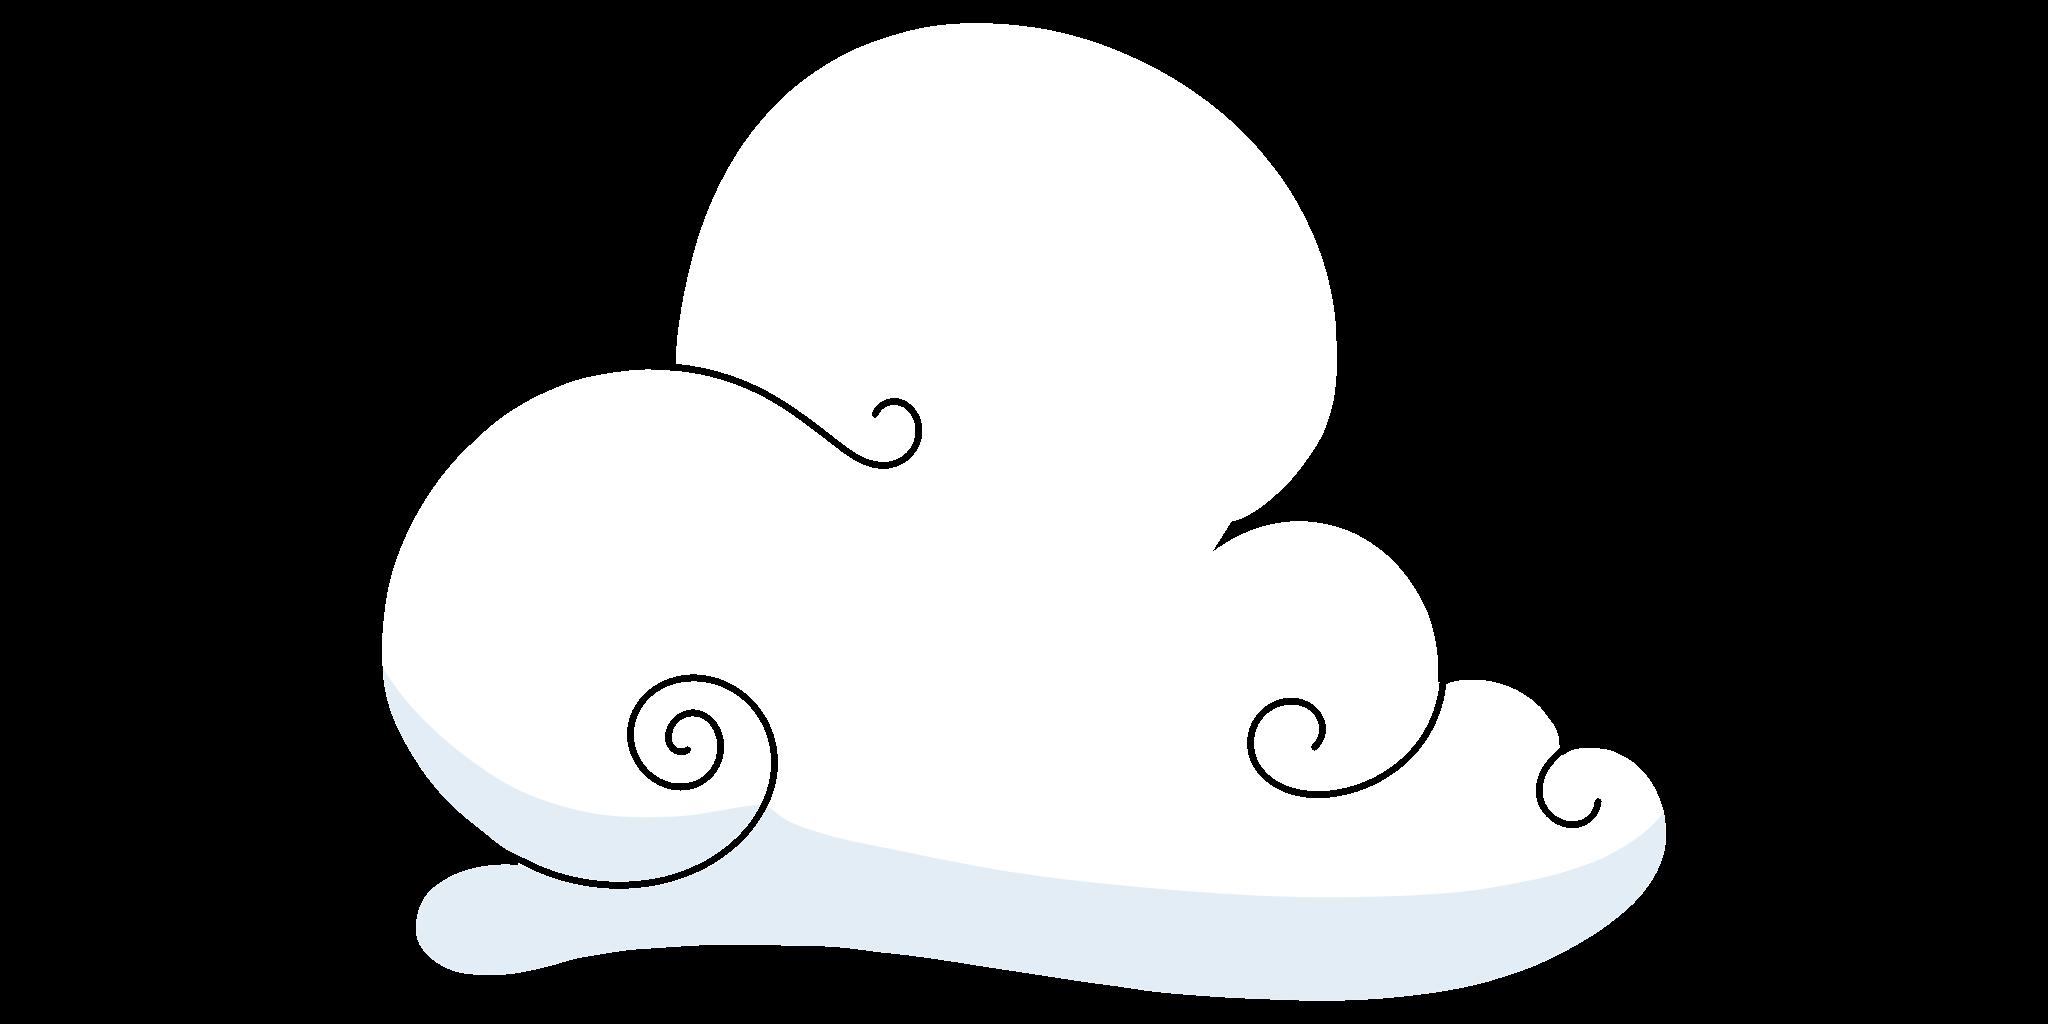 datasrc/mapres/bg_cloud2.png